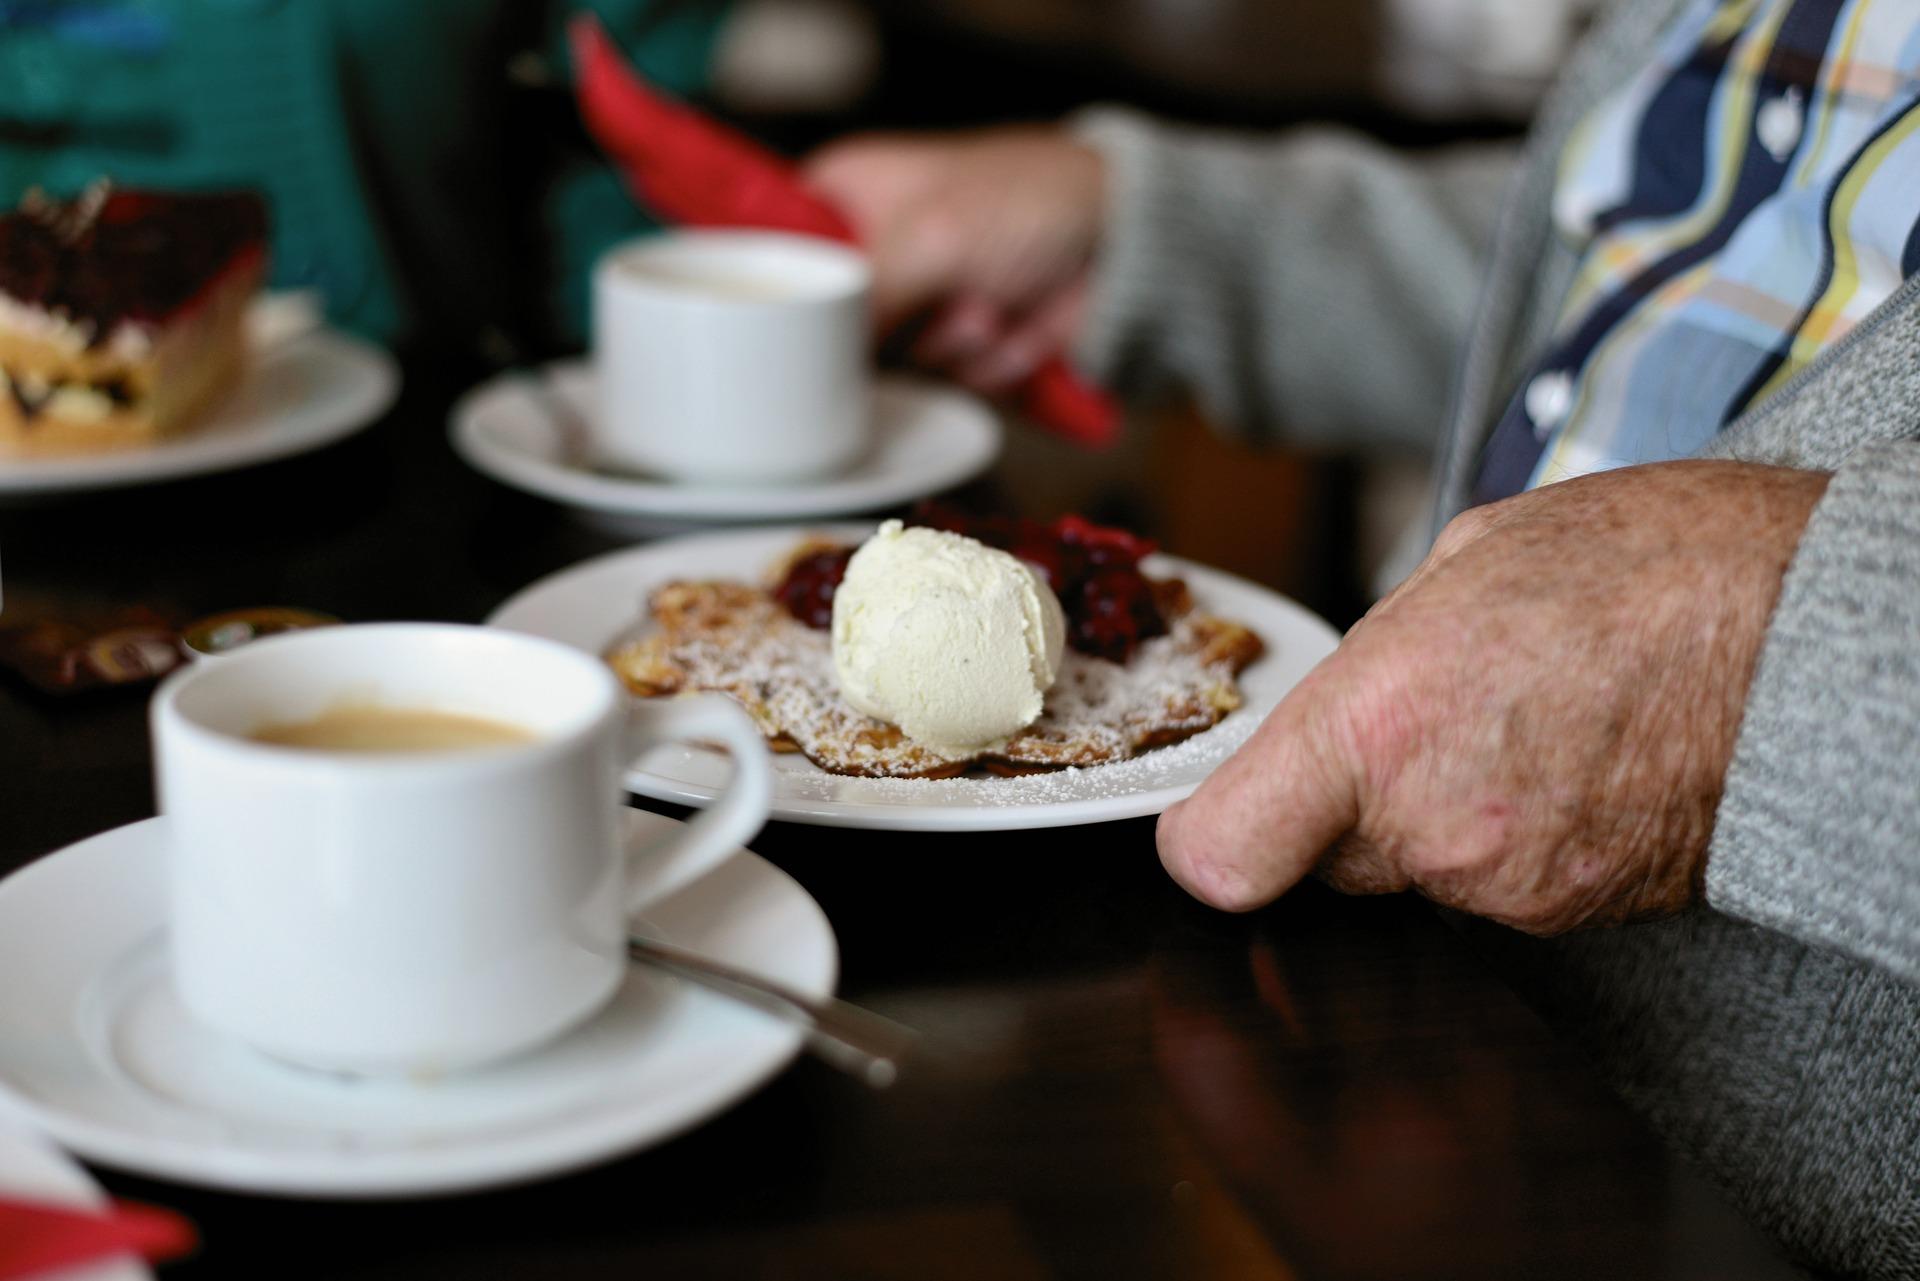 Cafe-Rueckblick_Eis-essen